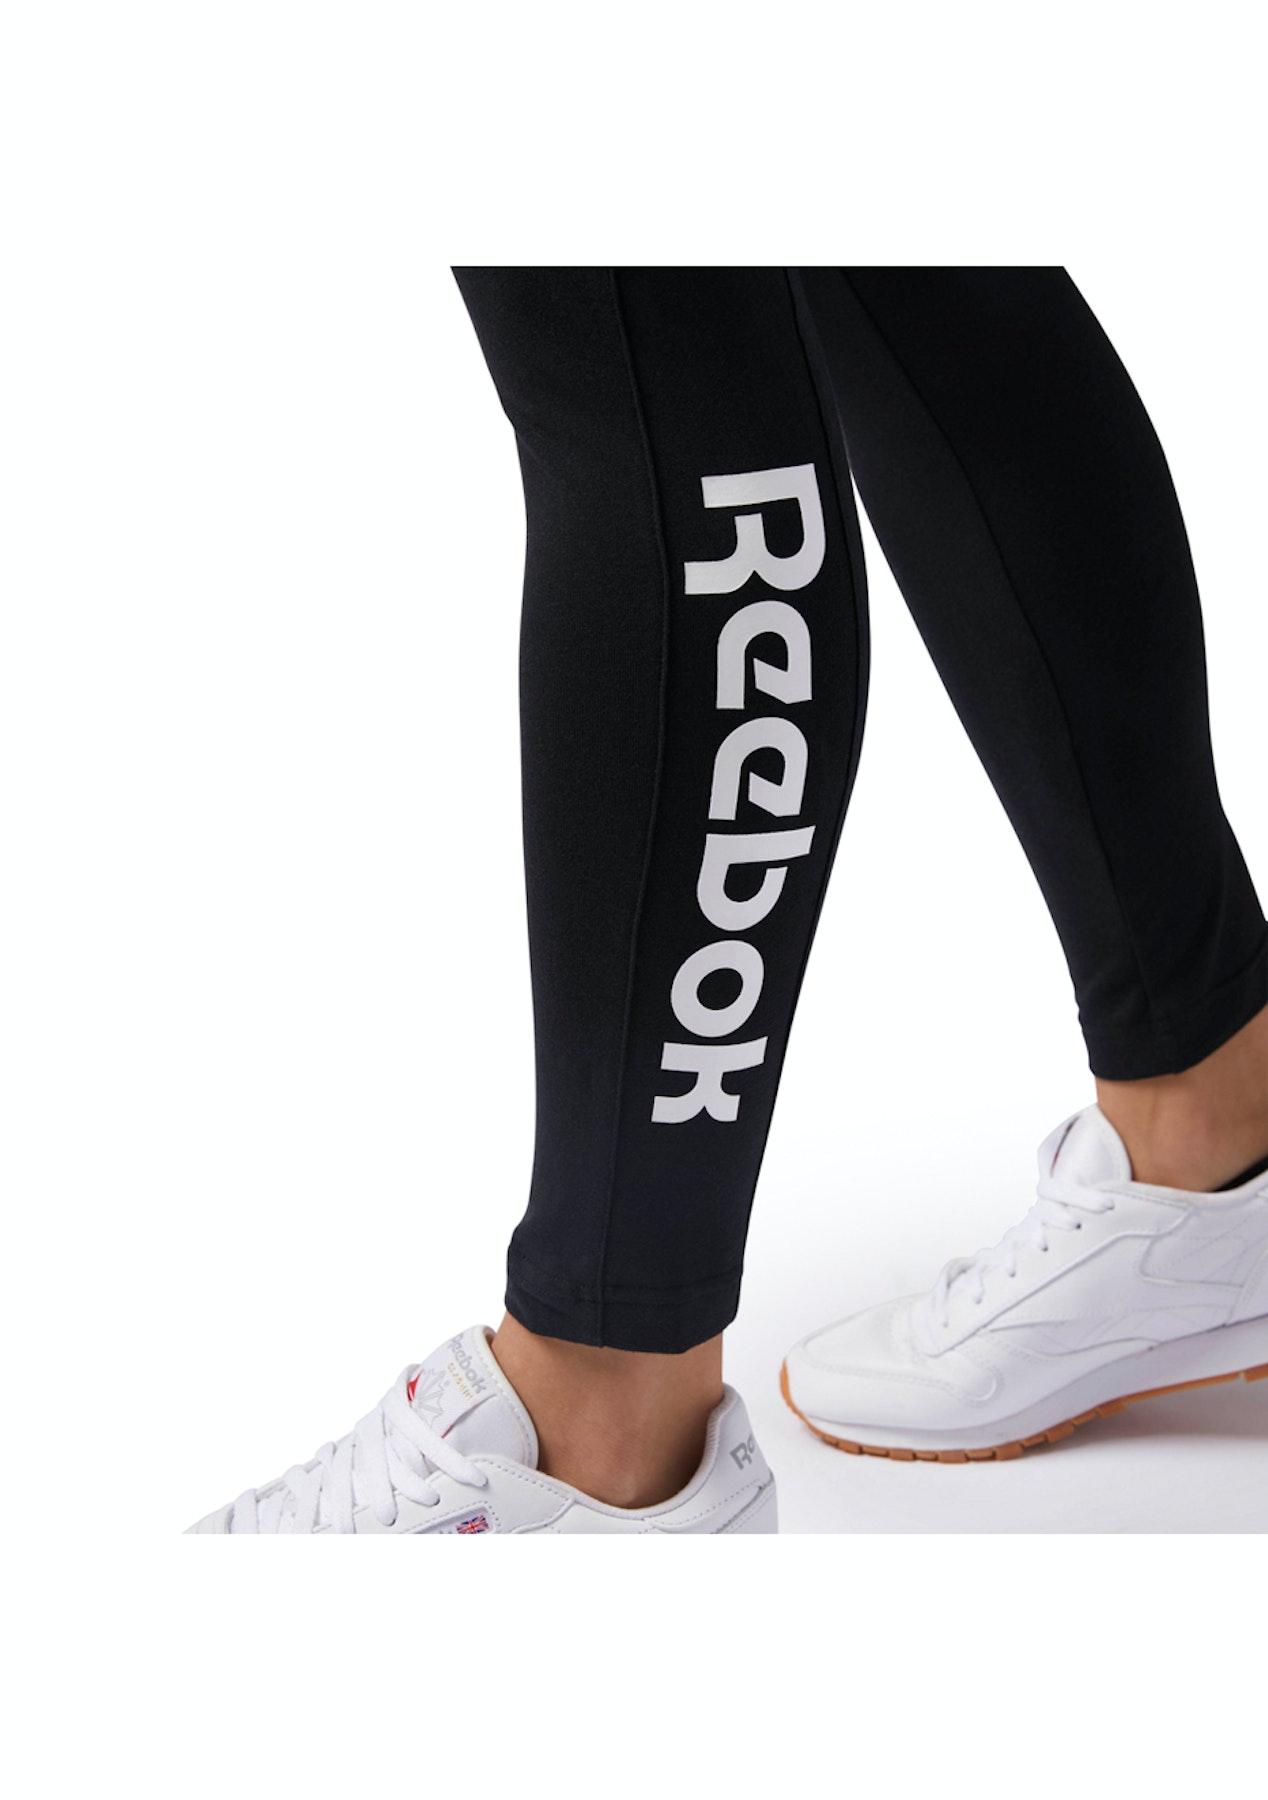 5712520cbeafc Reebok Womens - F Logo Legging - Black - Under Armour & More - Onceit